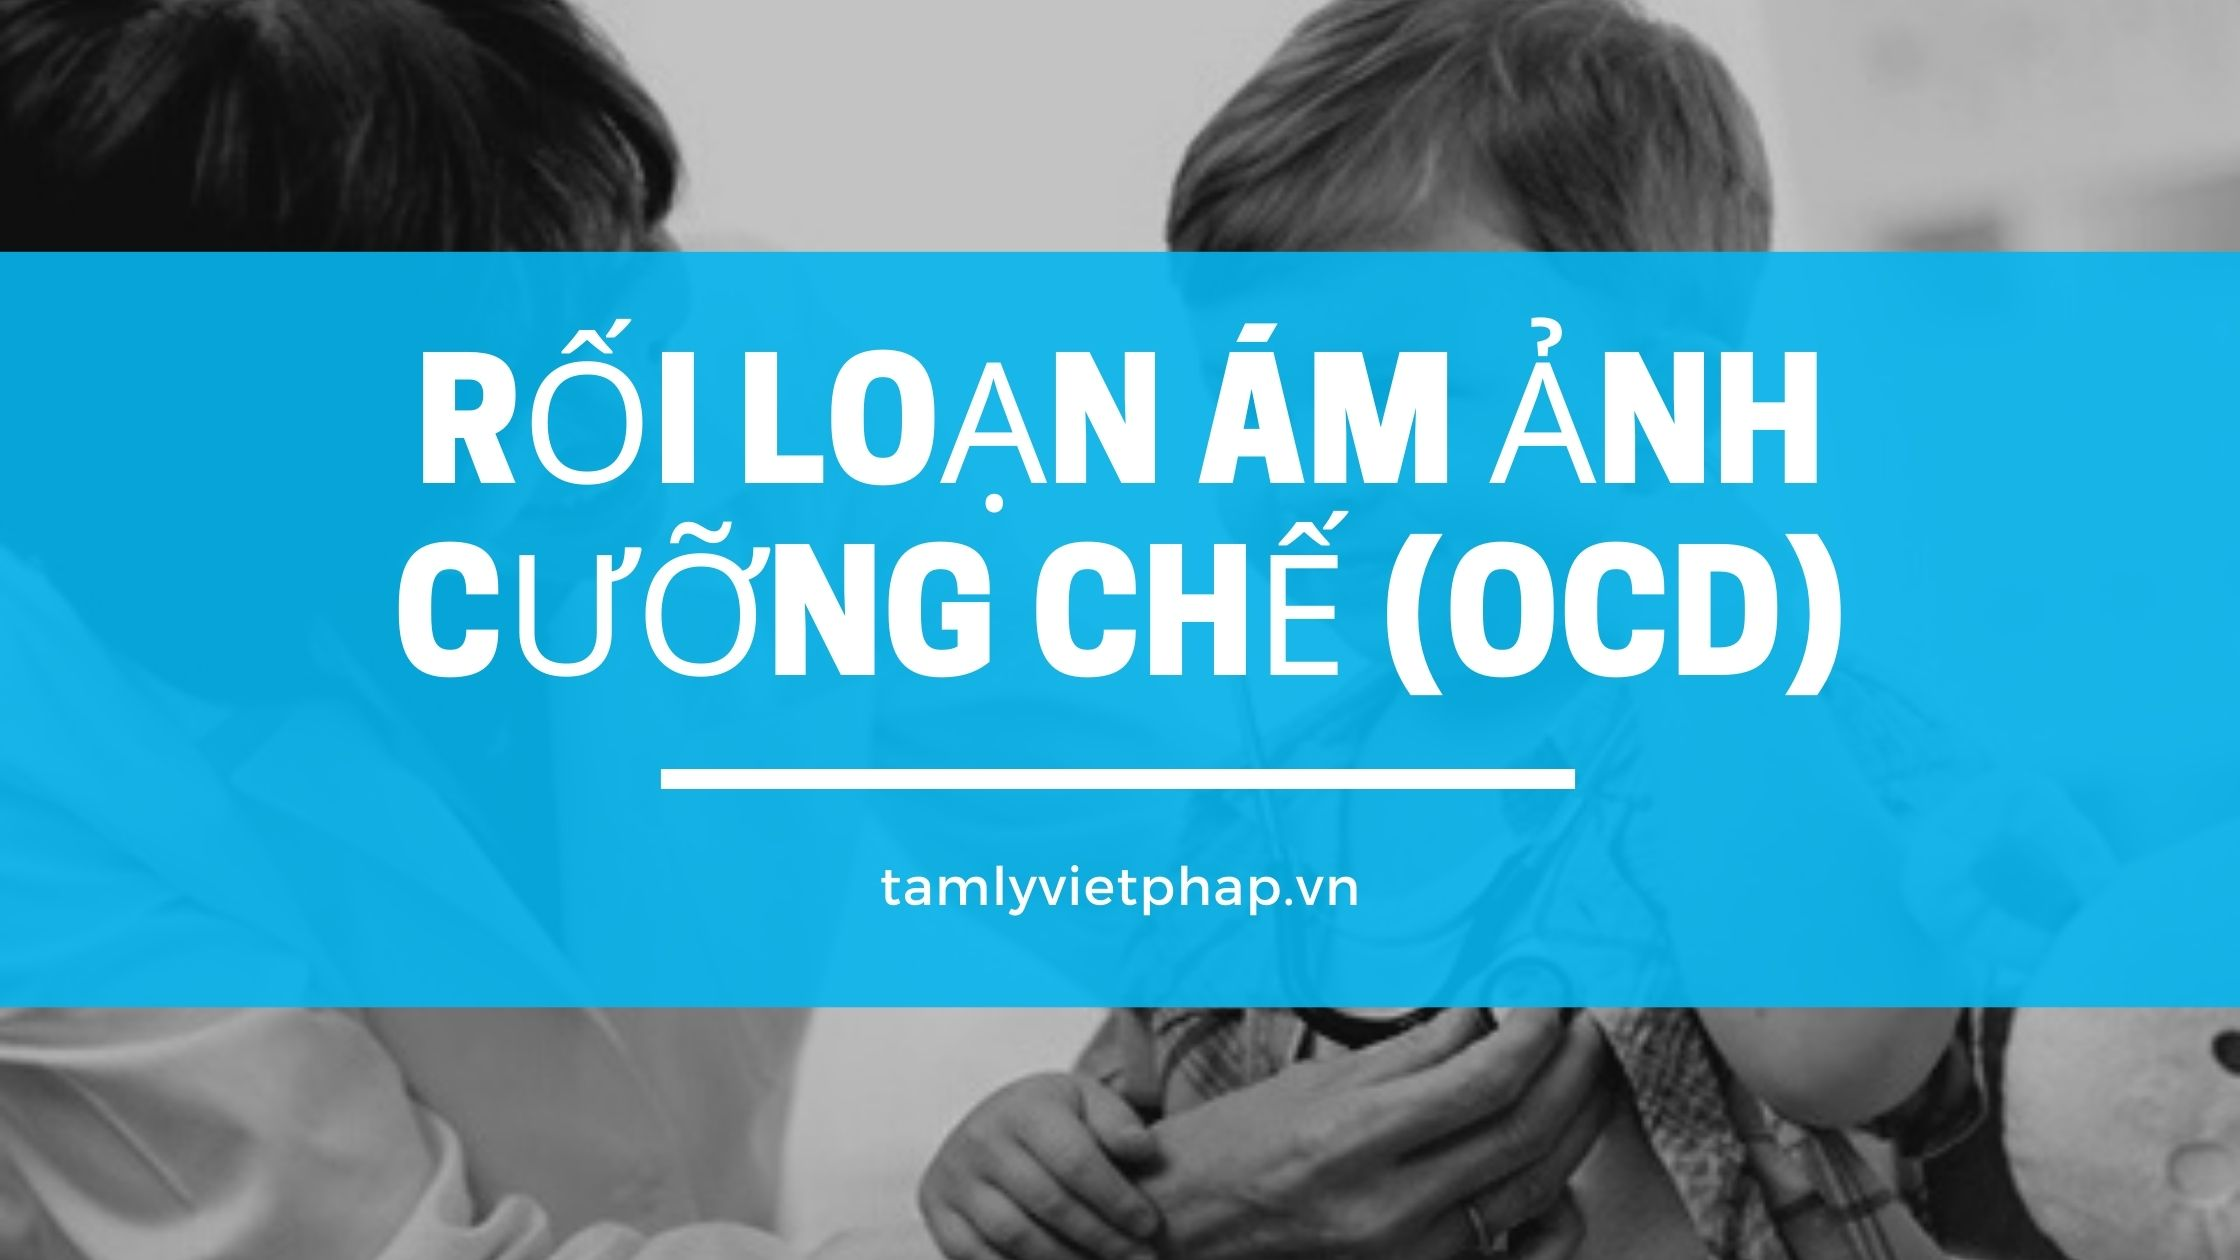 OCD_roi_loan_am_anh_cuong_che